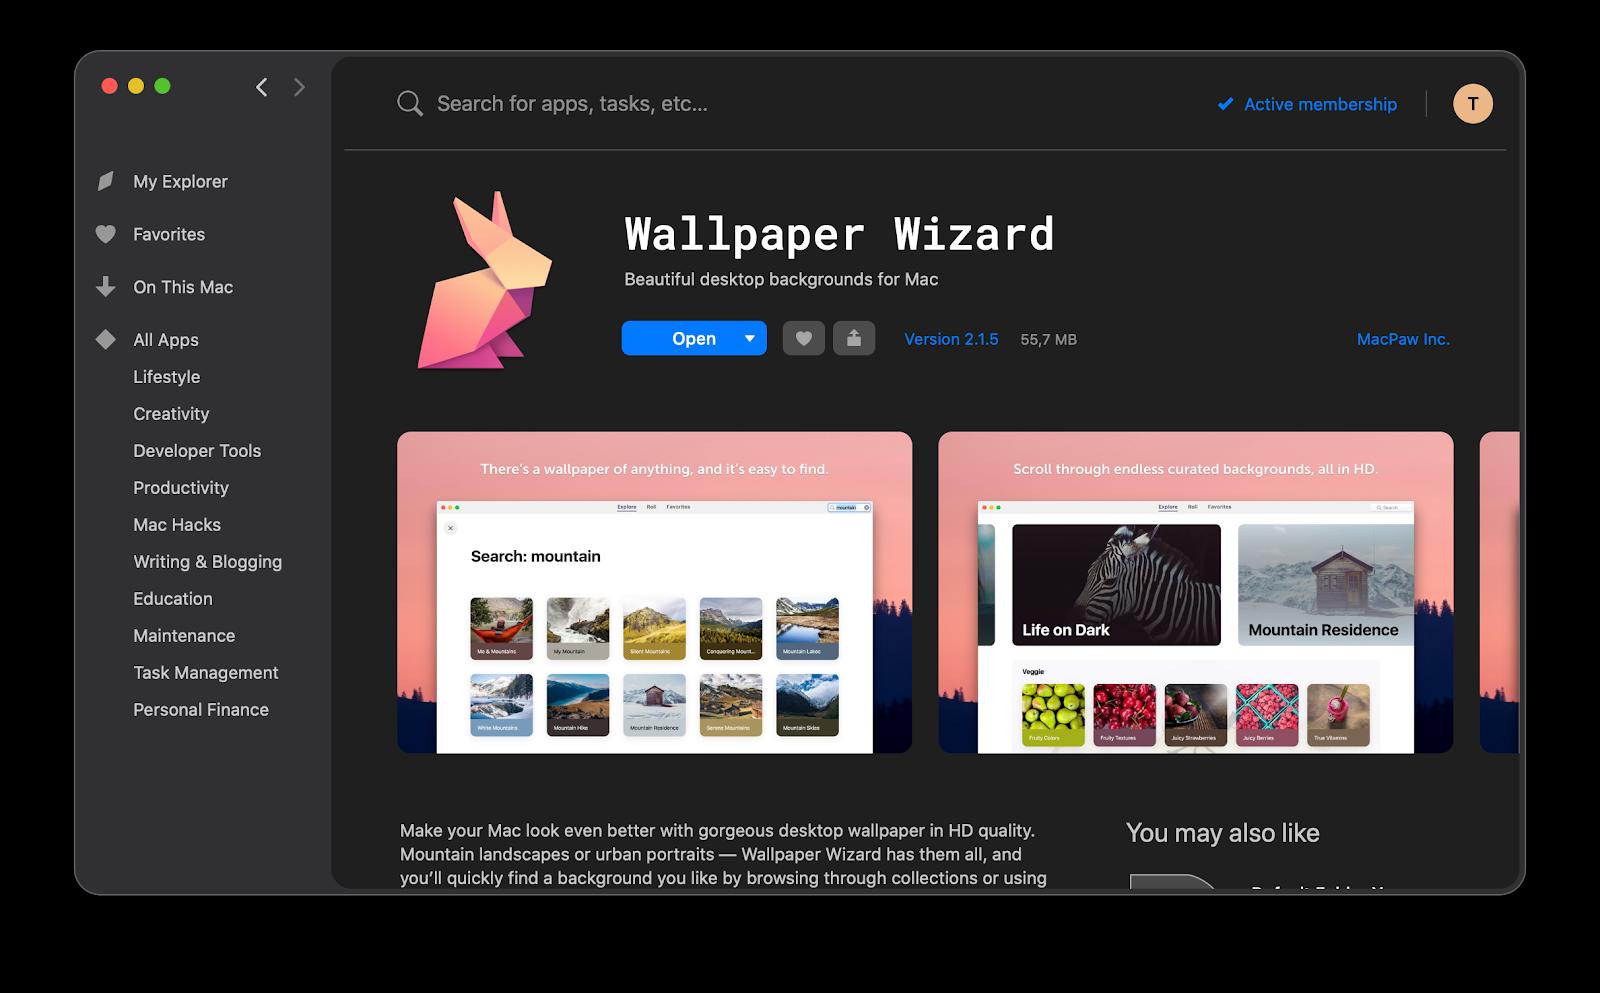 Wallpaper Wizard app